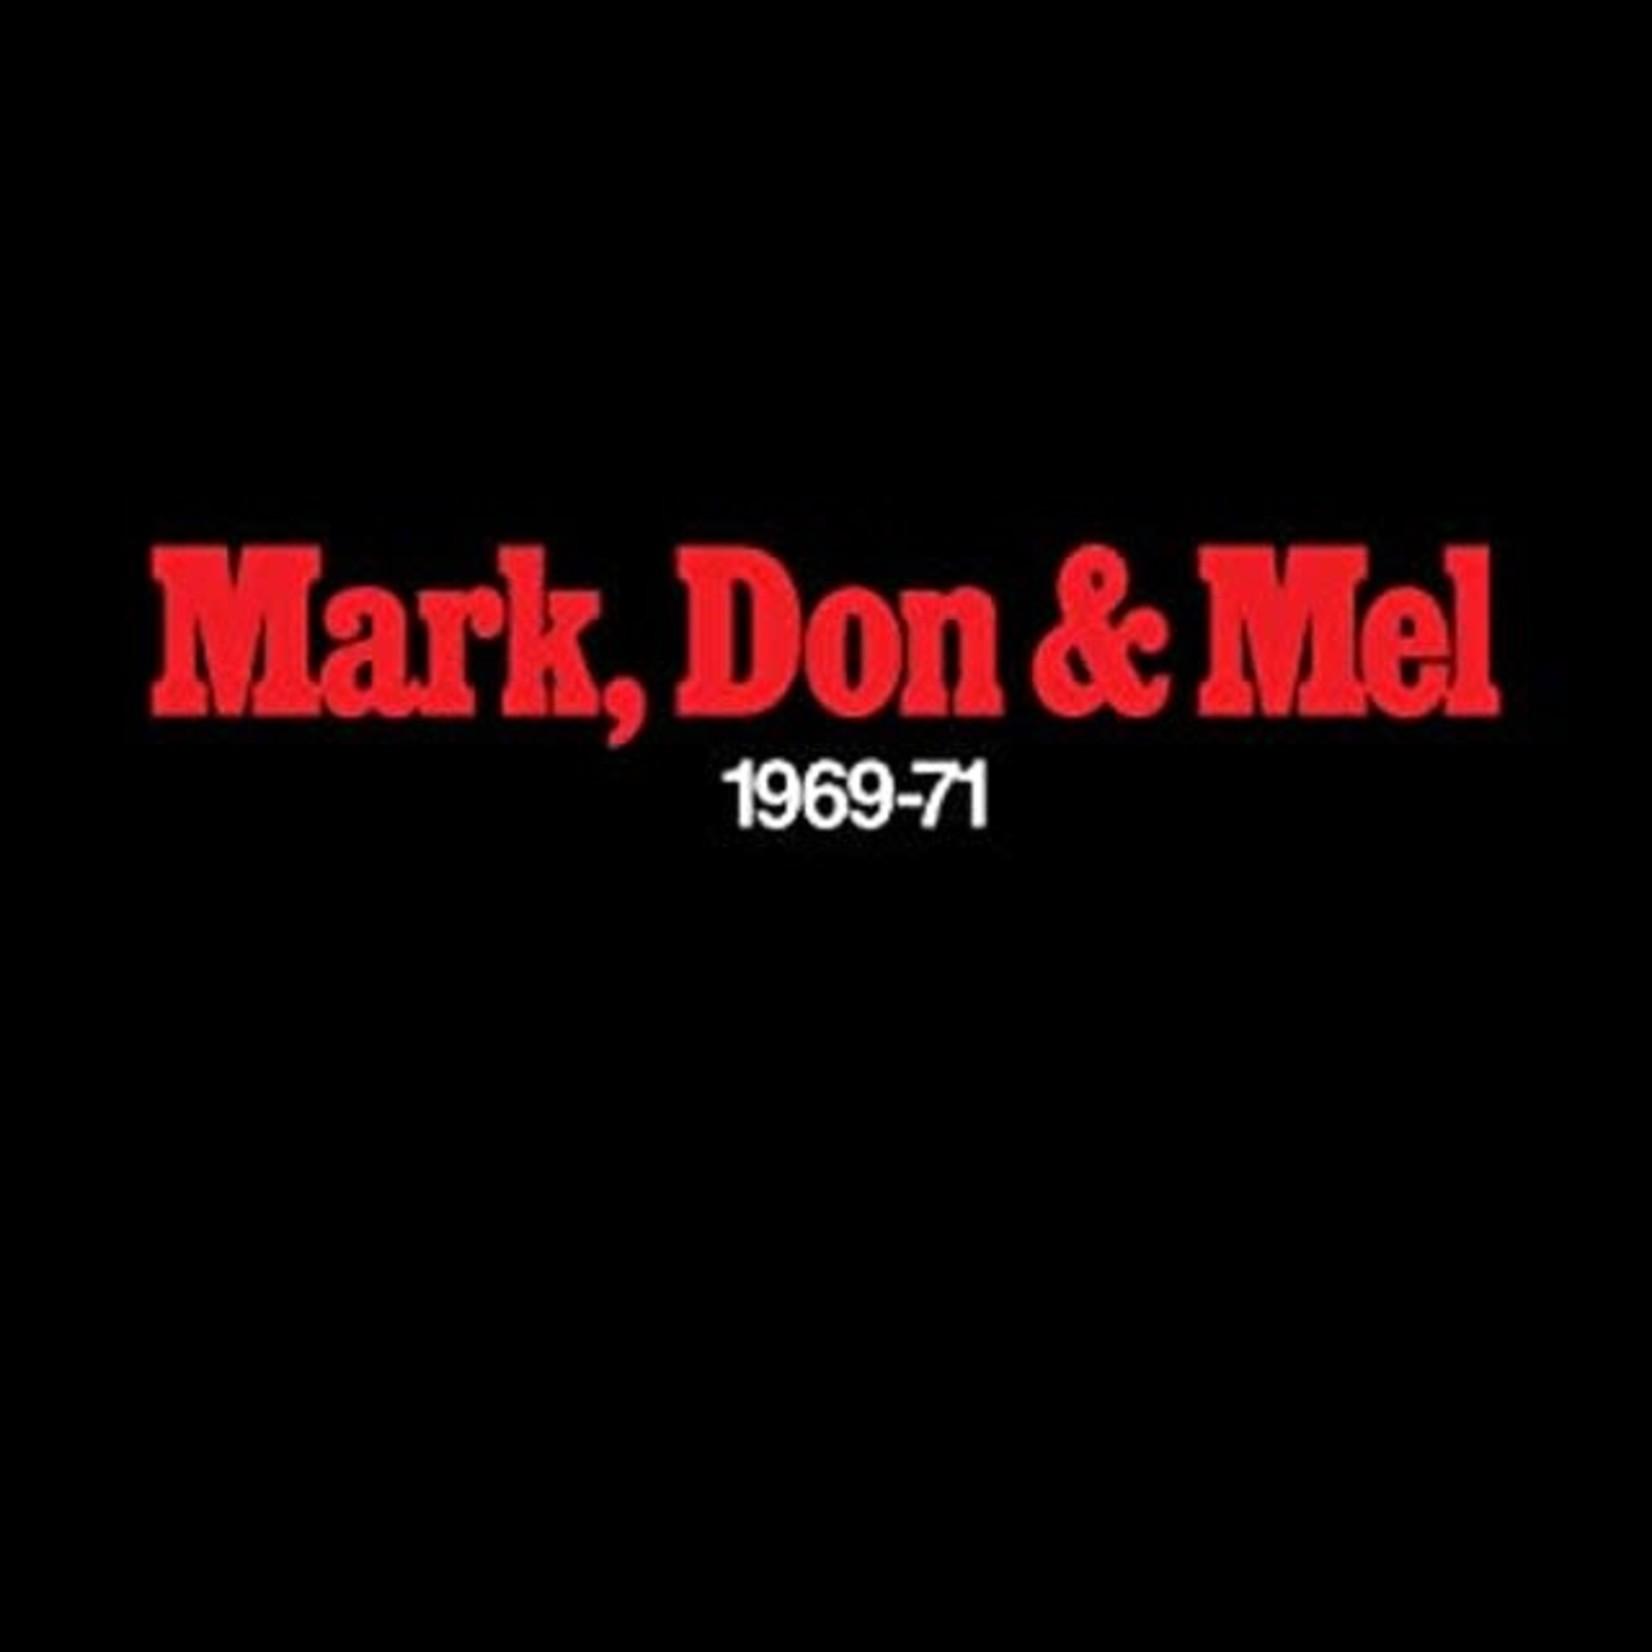 Vinyl Grand Funk Railroad - Mark, Don & Mel  1969-71